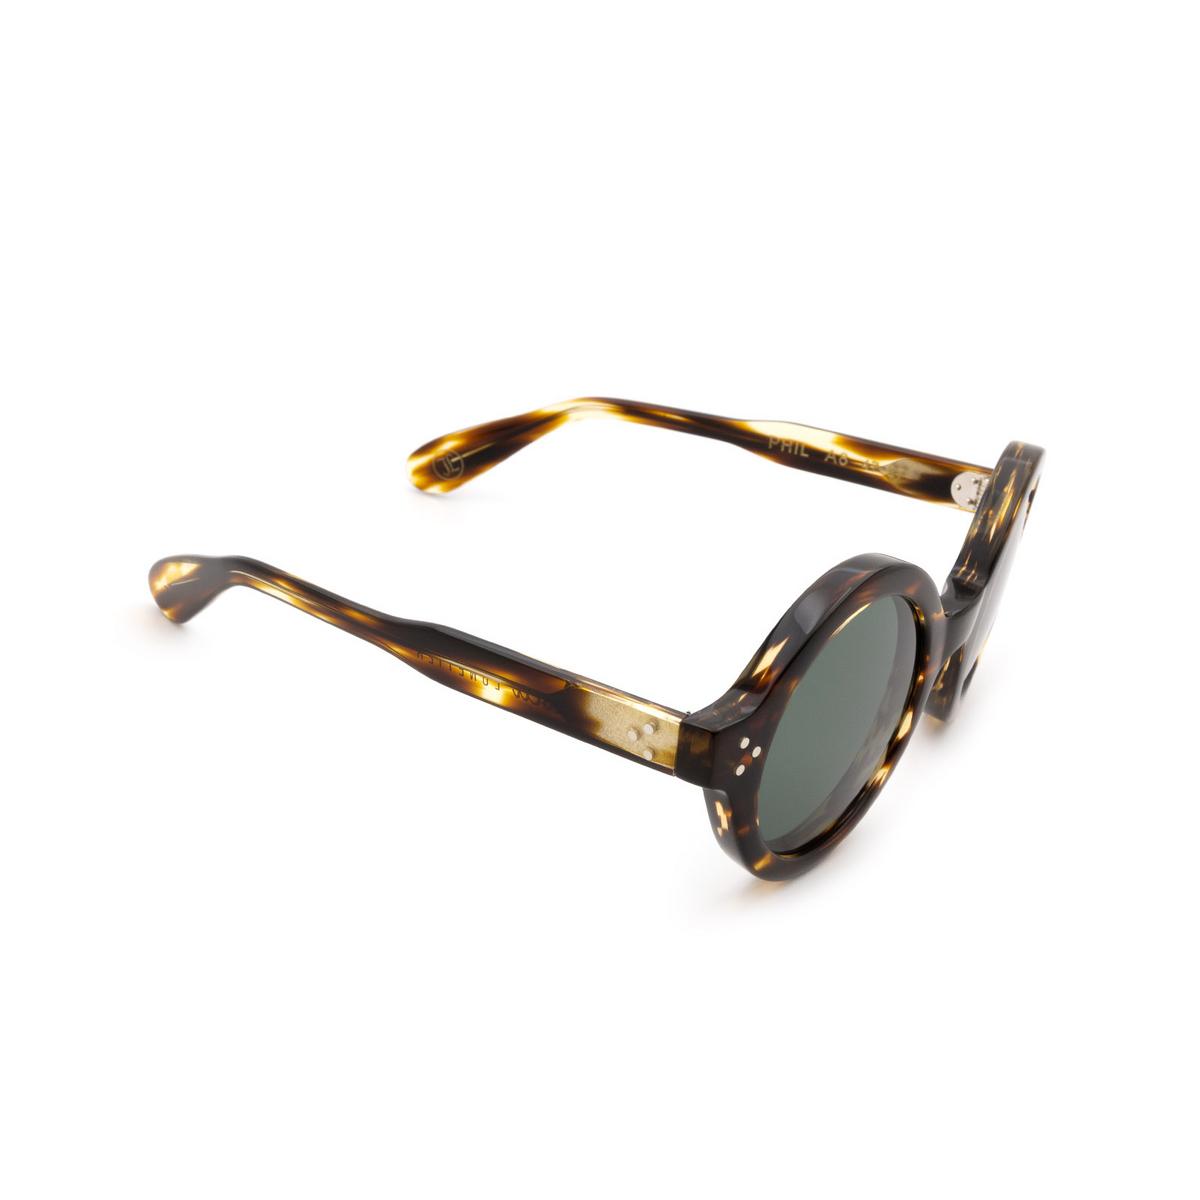 Lesca® Round Sunglasses: Phil Sun color Light Tortoise Tortoise A8 - three-quarters view.